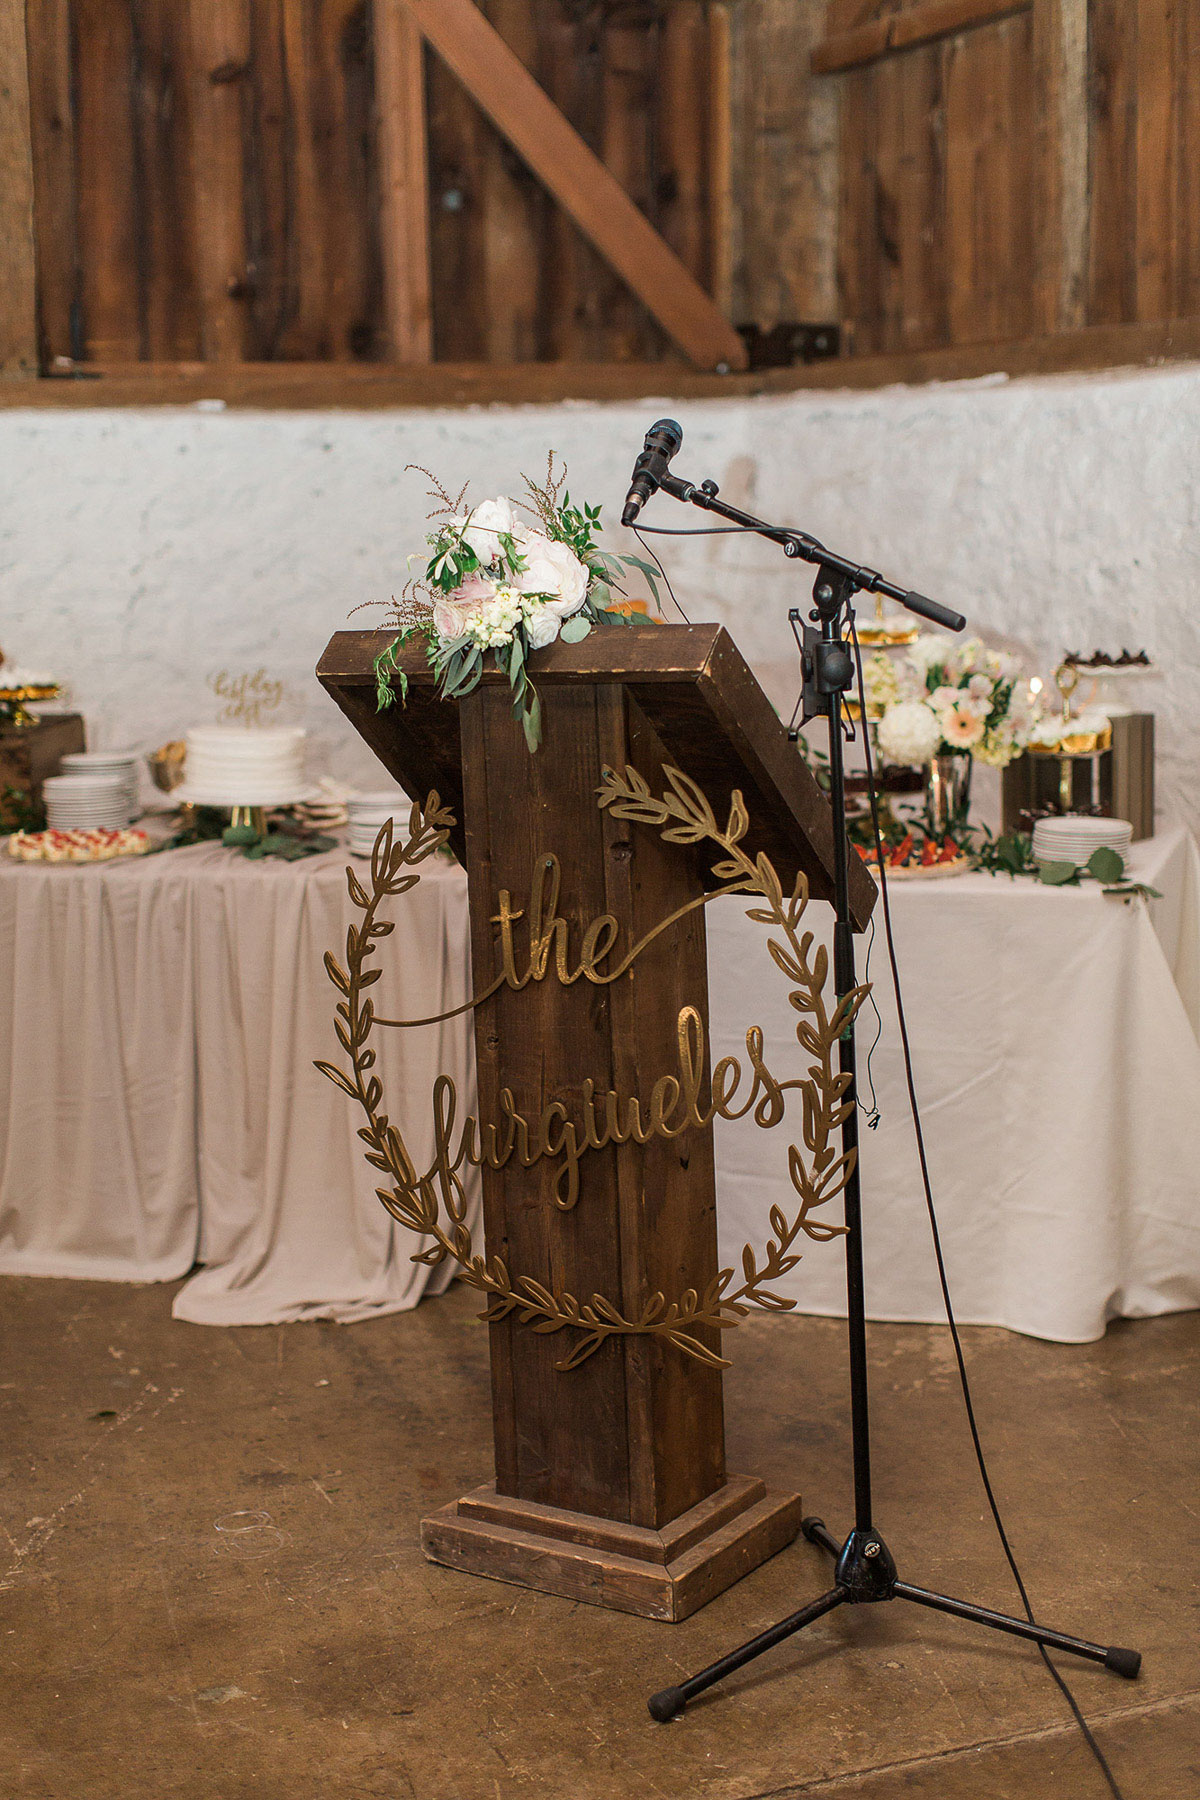 beatrice-elford-photography-vineyard-bride-swish-list-balls-falls-vineland-wedding-57.jpg